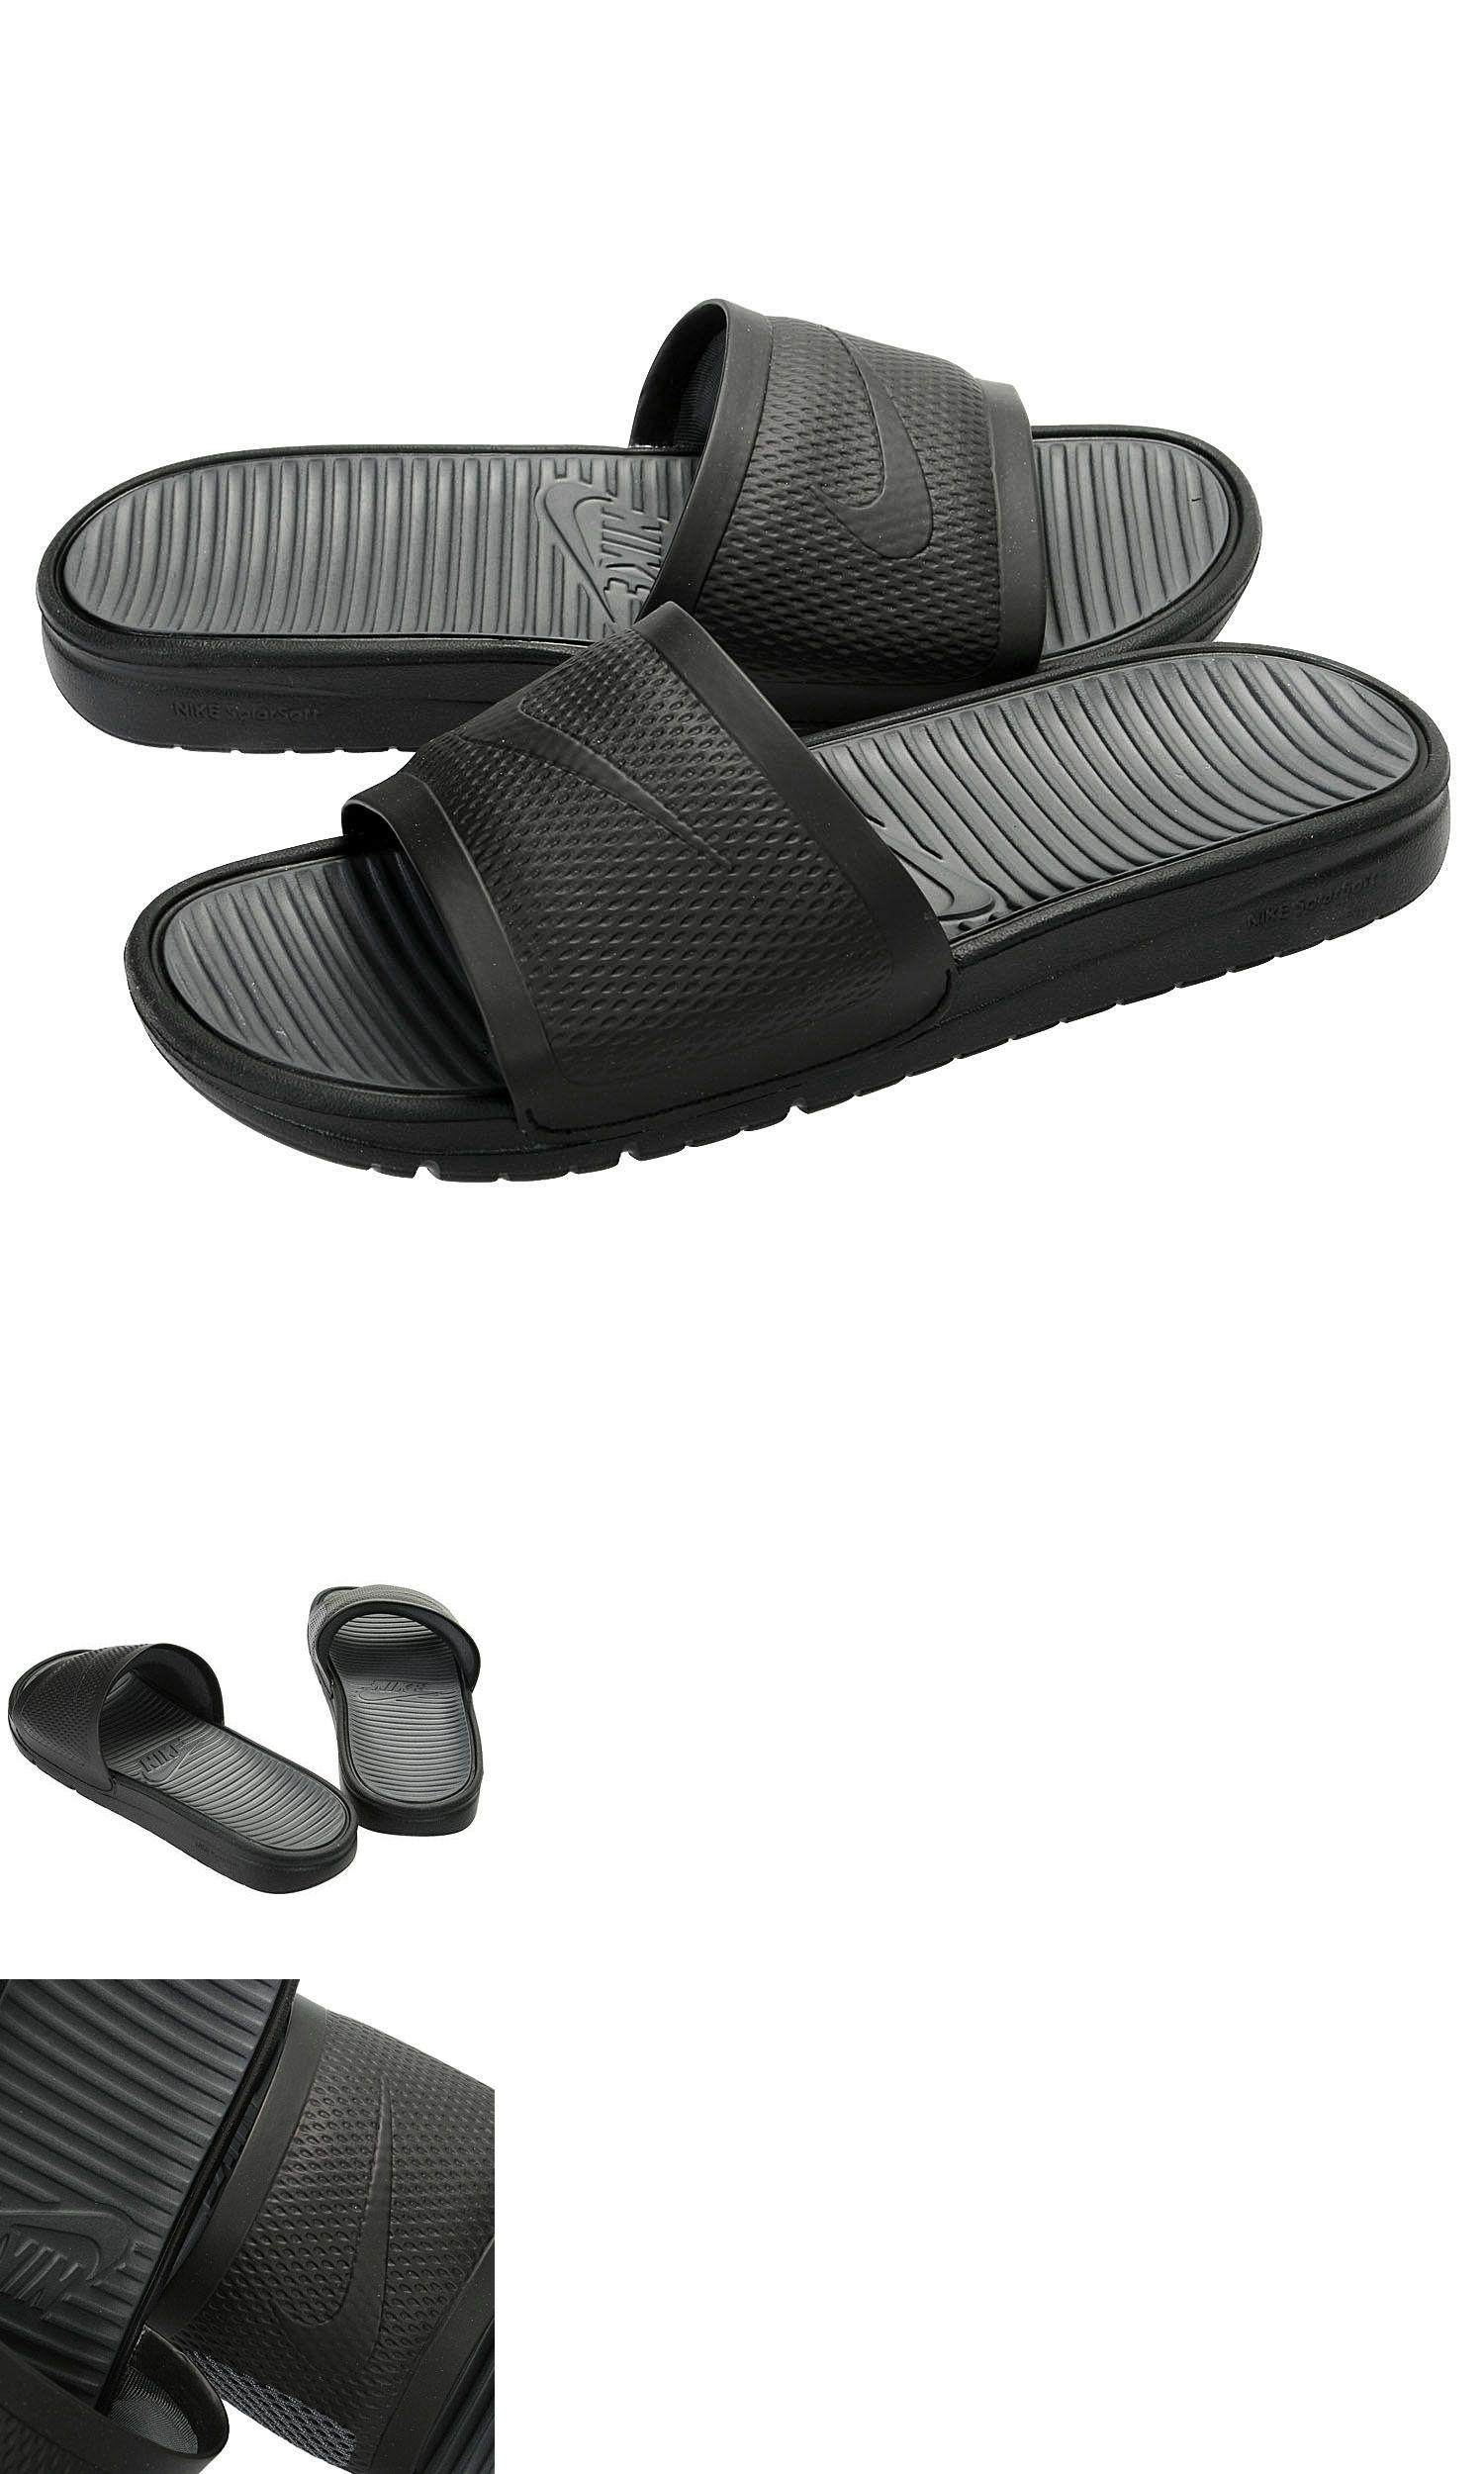 8a1bf7ac7 Sandals and Flip Flops 11504: Nike Benassi Solarsoft Slide Black Black-Dark  Grey 431884 001 Mens Free Shipping -> BUY IT NOW ONLY: $36.35 on eBay!